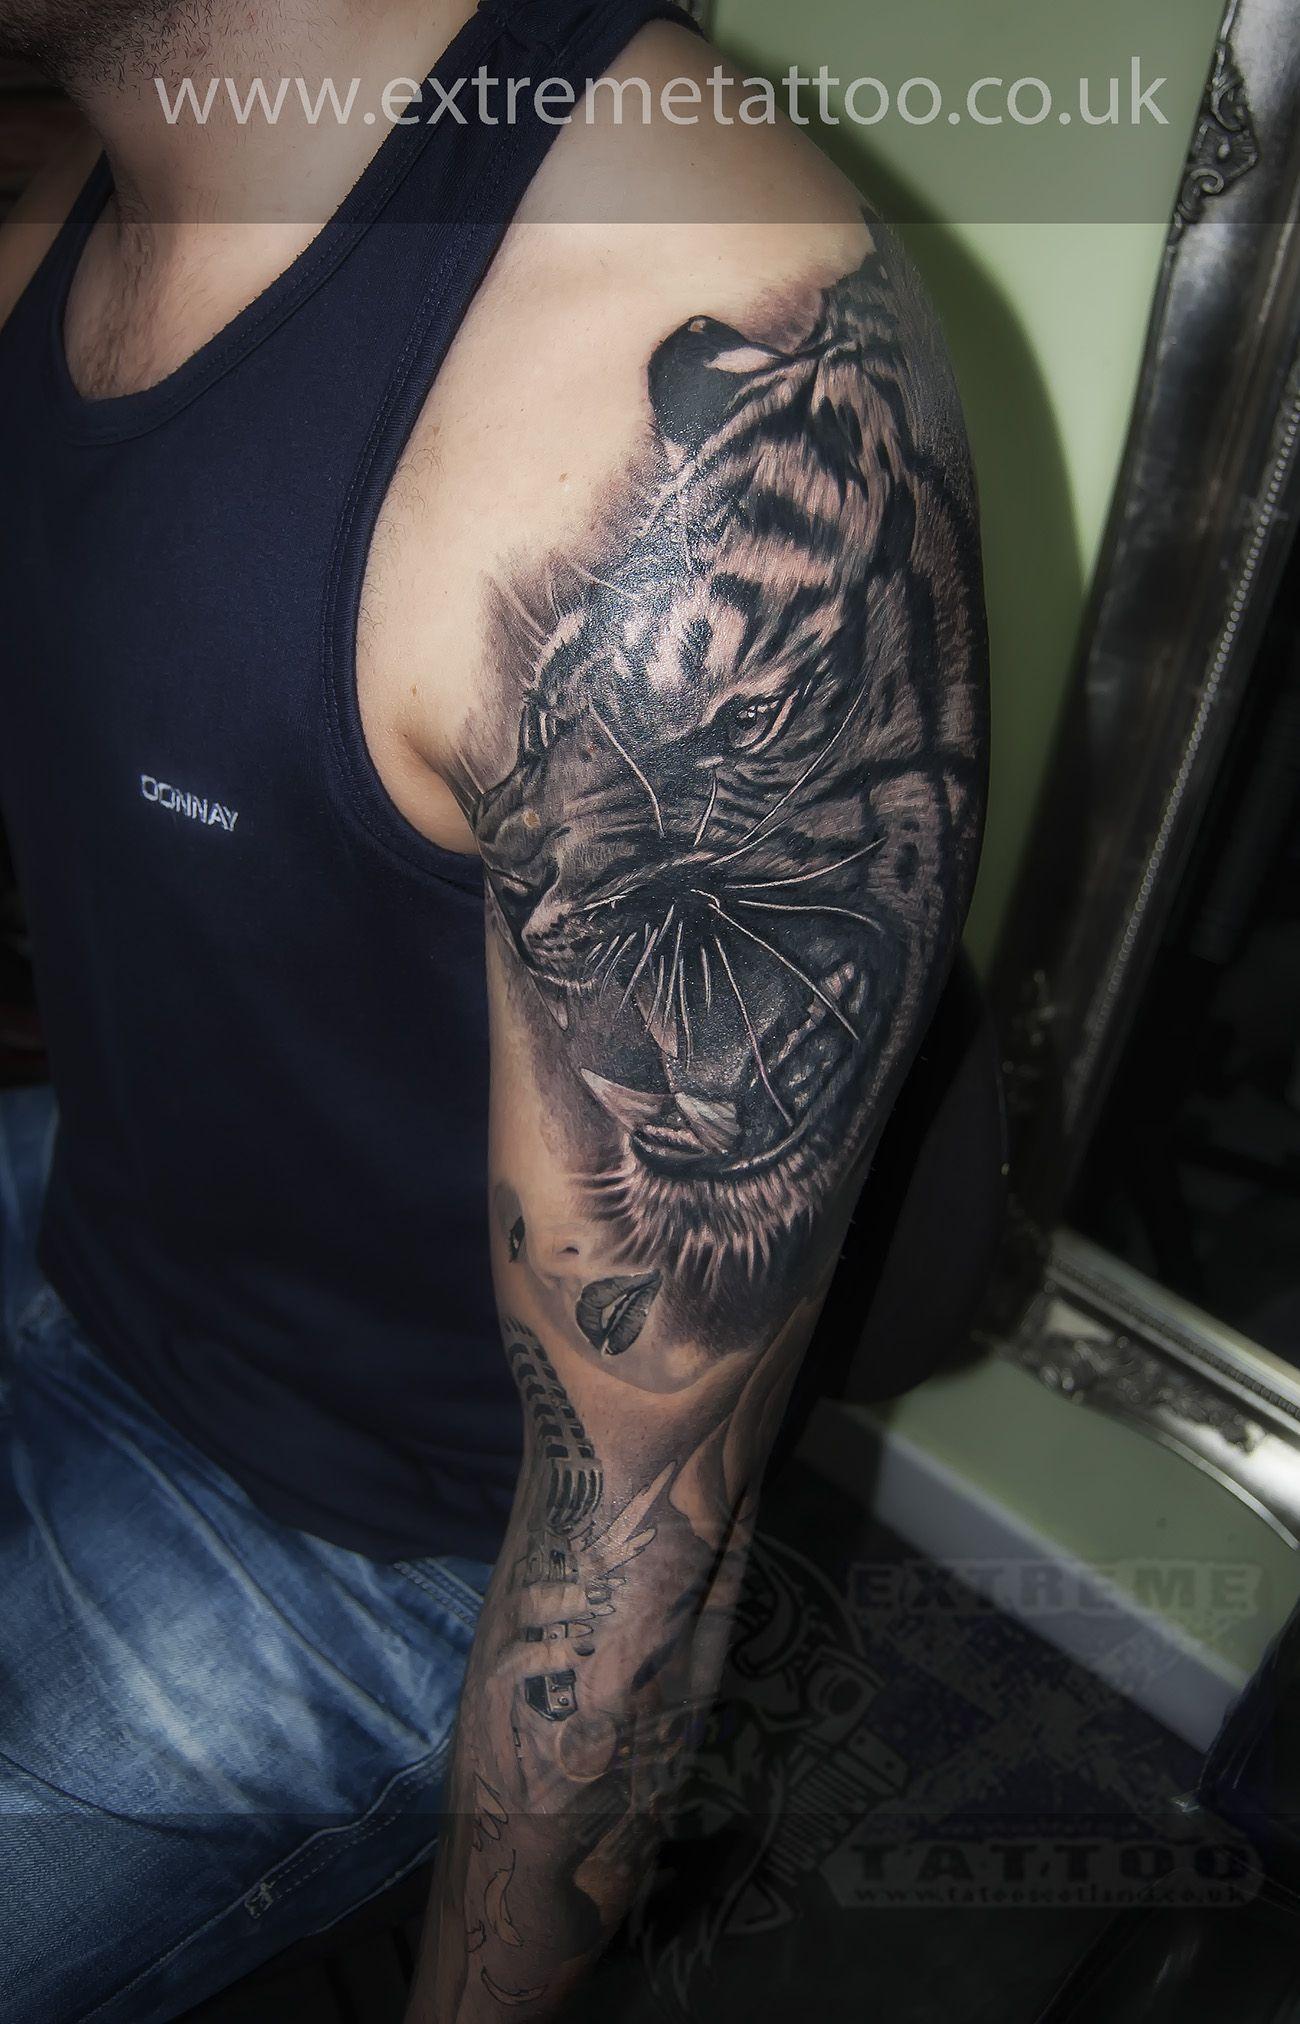 Maori Tattoo Cover Up: Tiger Cover Up Tattoo,Gabi Tomescu.Extreme Tattoo&piercing